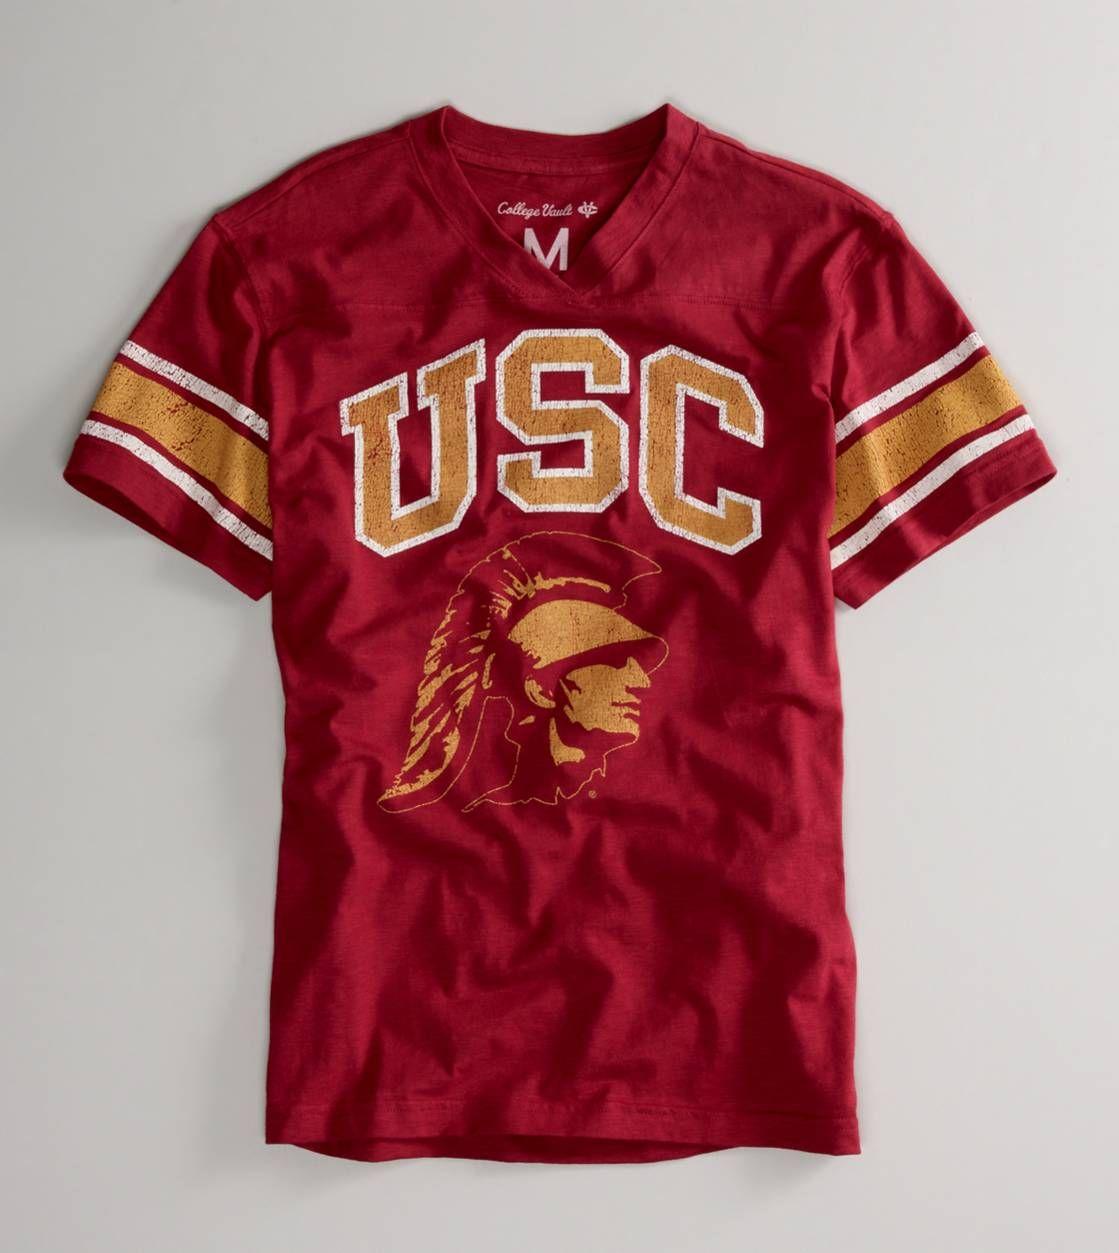 d51ddf8bc USC Vintage Football T-shirt (American Eagle) | My Sports Team Aka ...